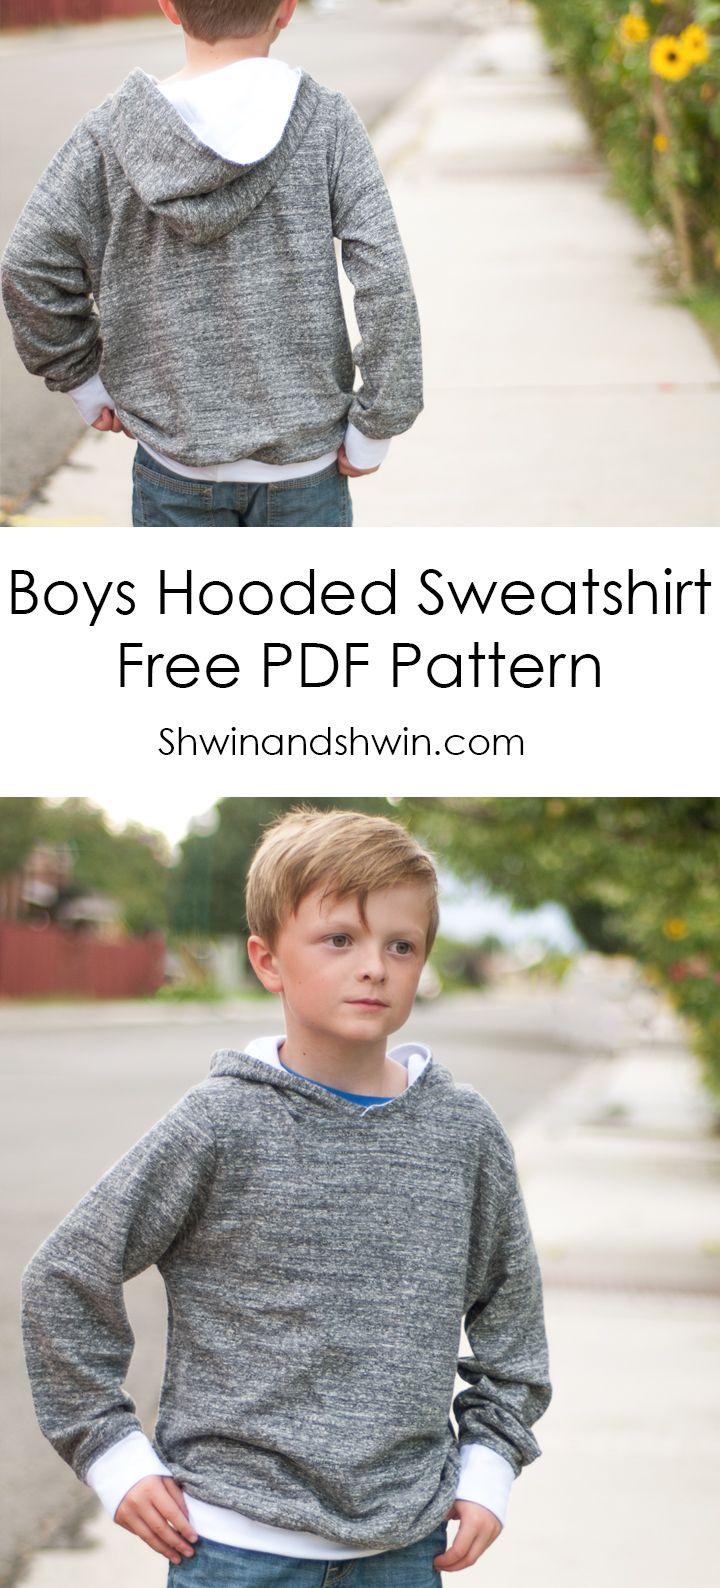 Boys Hooded Sweatshirt | Ropa de niña con moldura | Costura ...